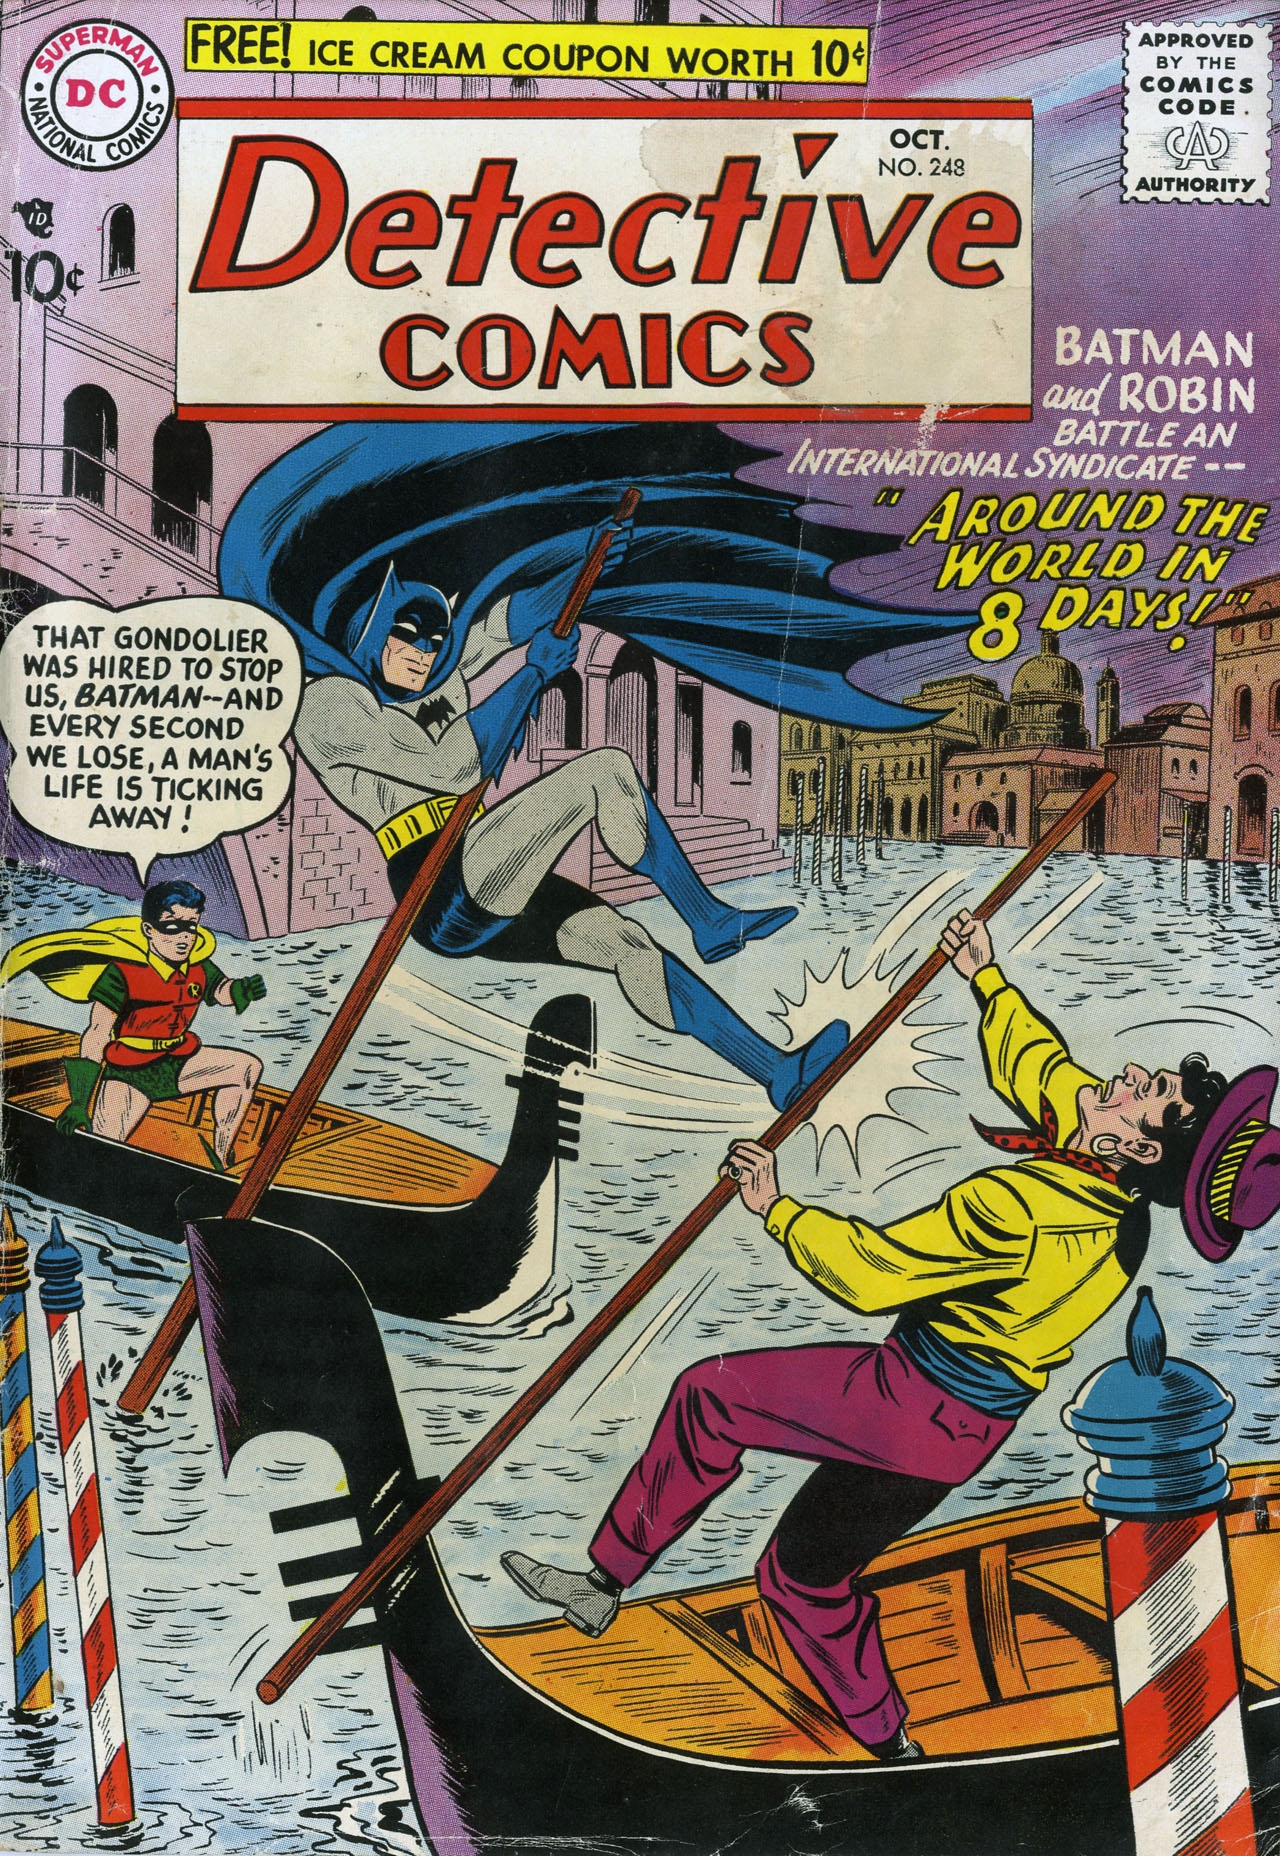 Read online Detective Comics (1937) comic -  Issue #248 - 1